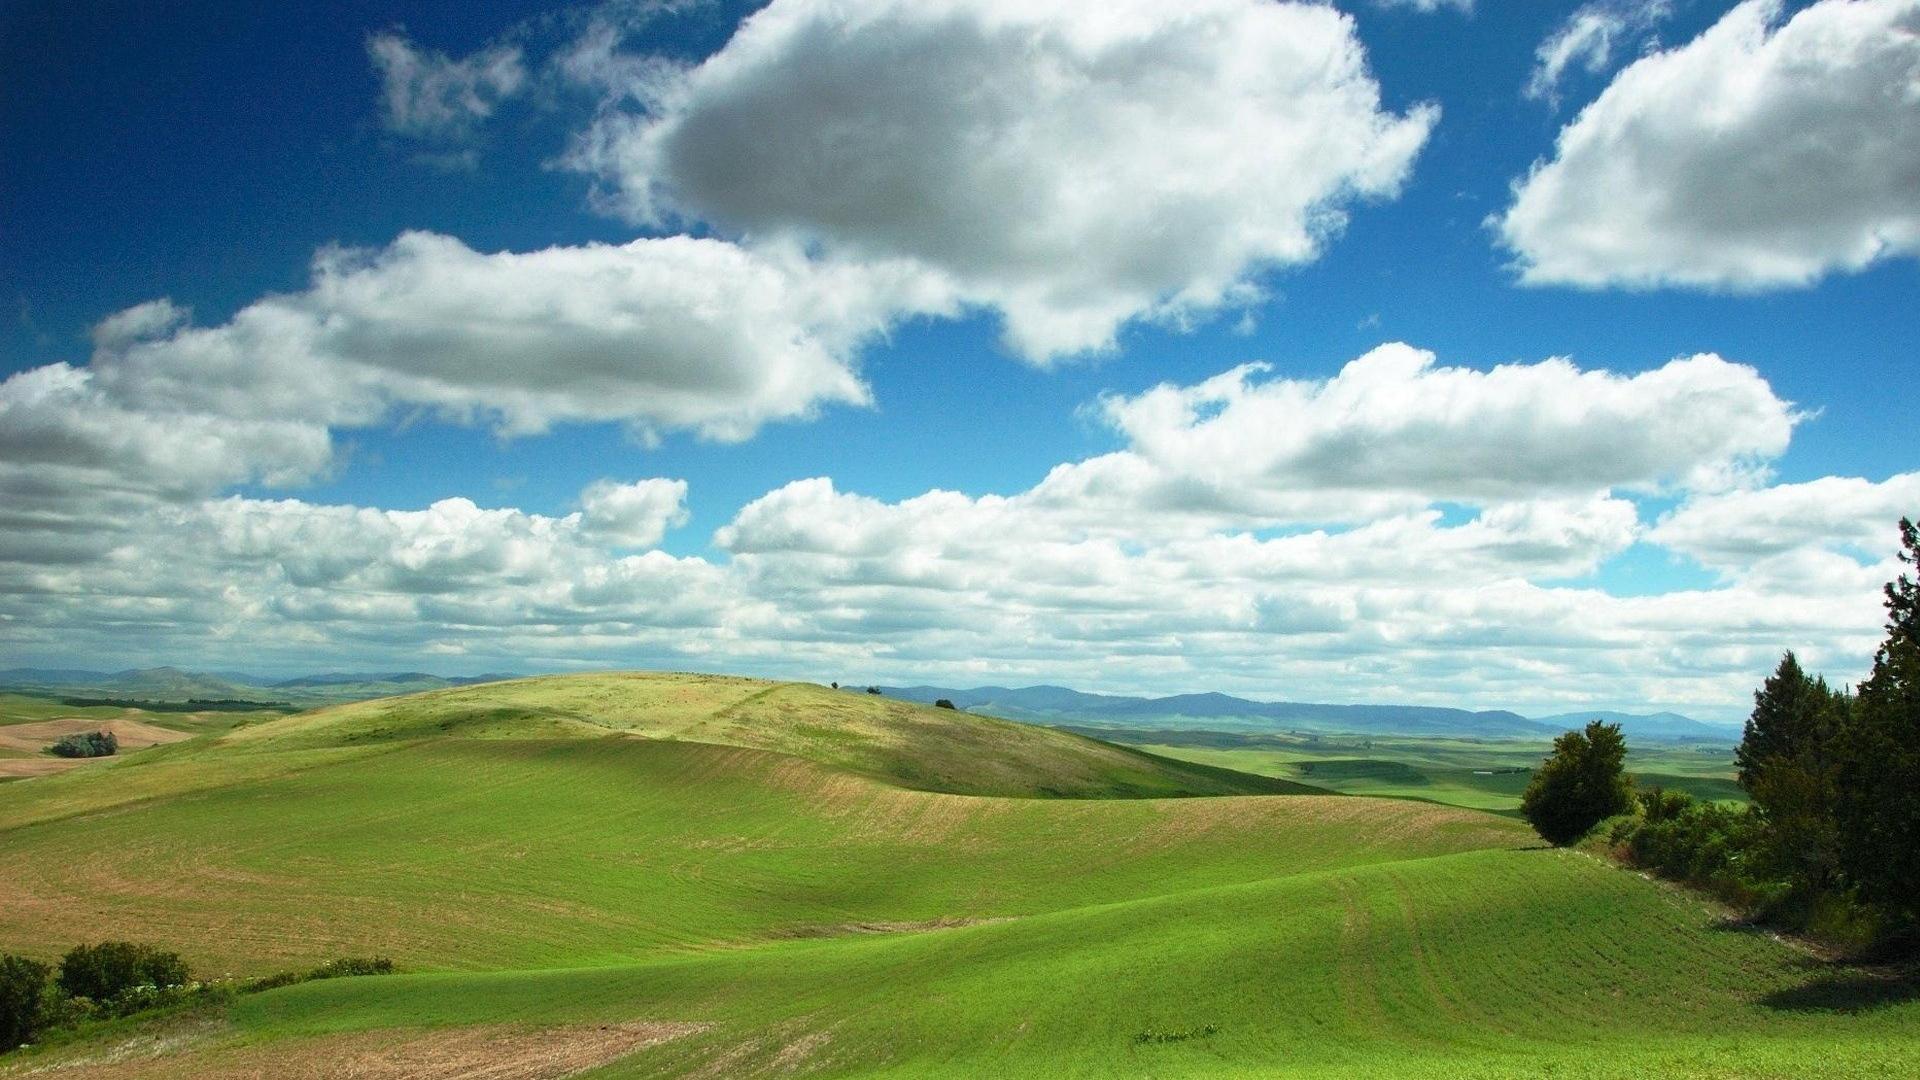 Download Wallpaper 1920x1080 plain, greens, clouds, fields ...